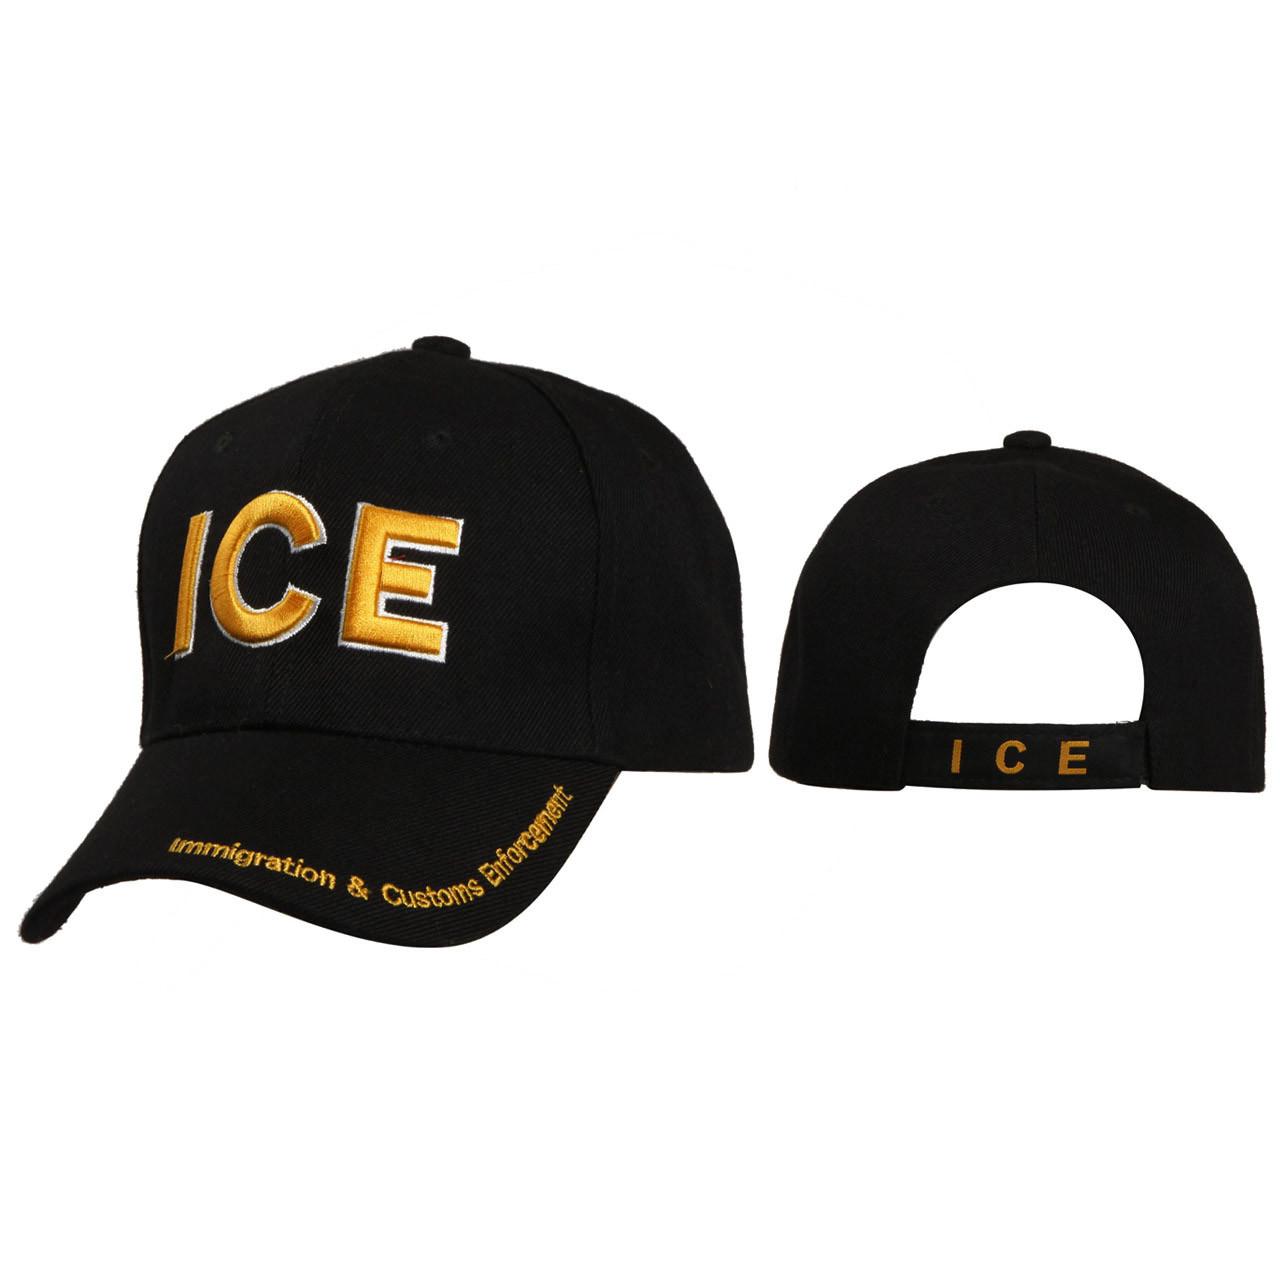 Wholesale Baseball Cap ~ ICE Immigration   Customs Enforcement ~ C1000 b252dca5b3c4